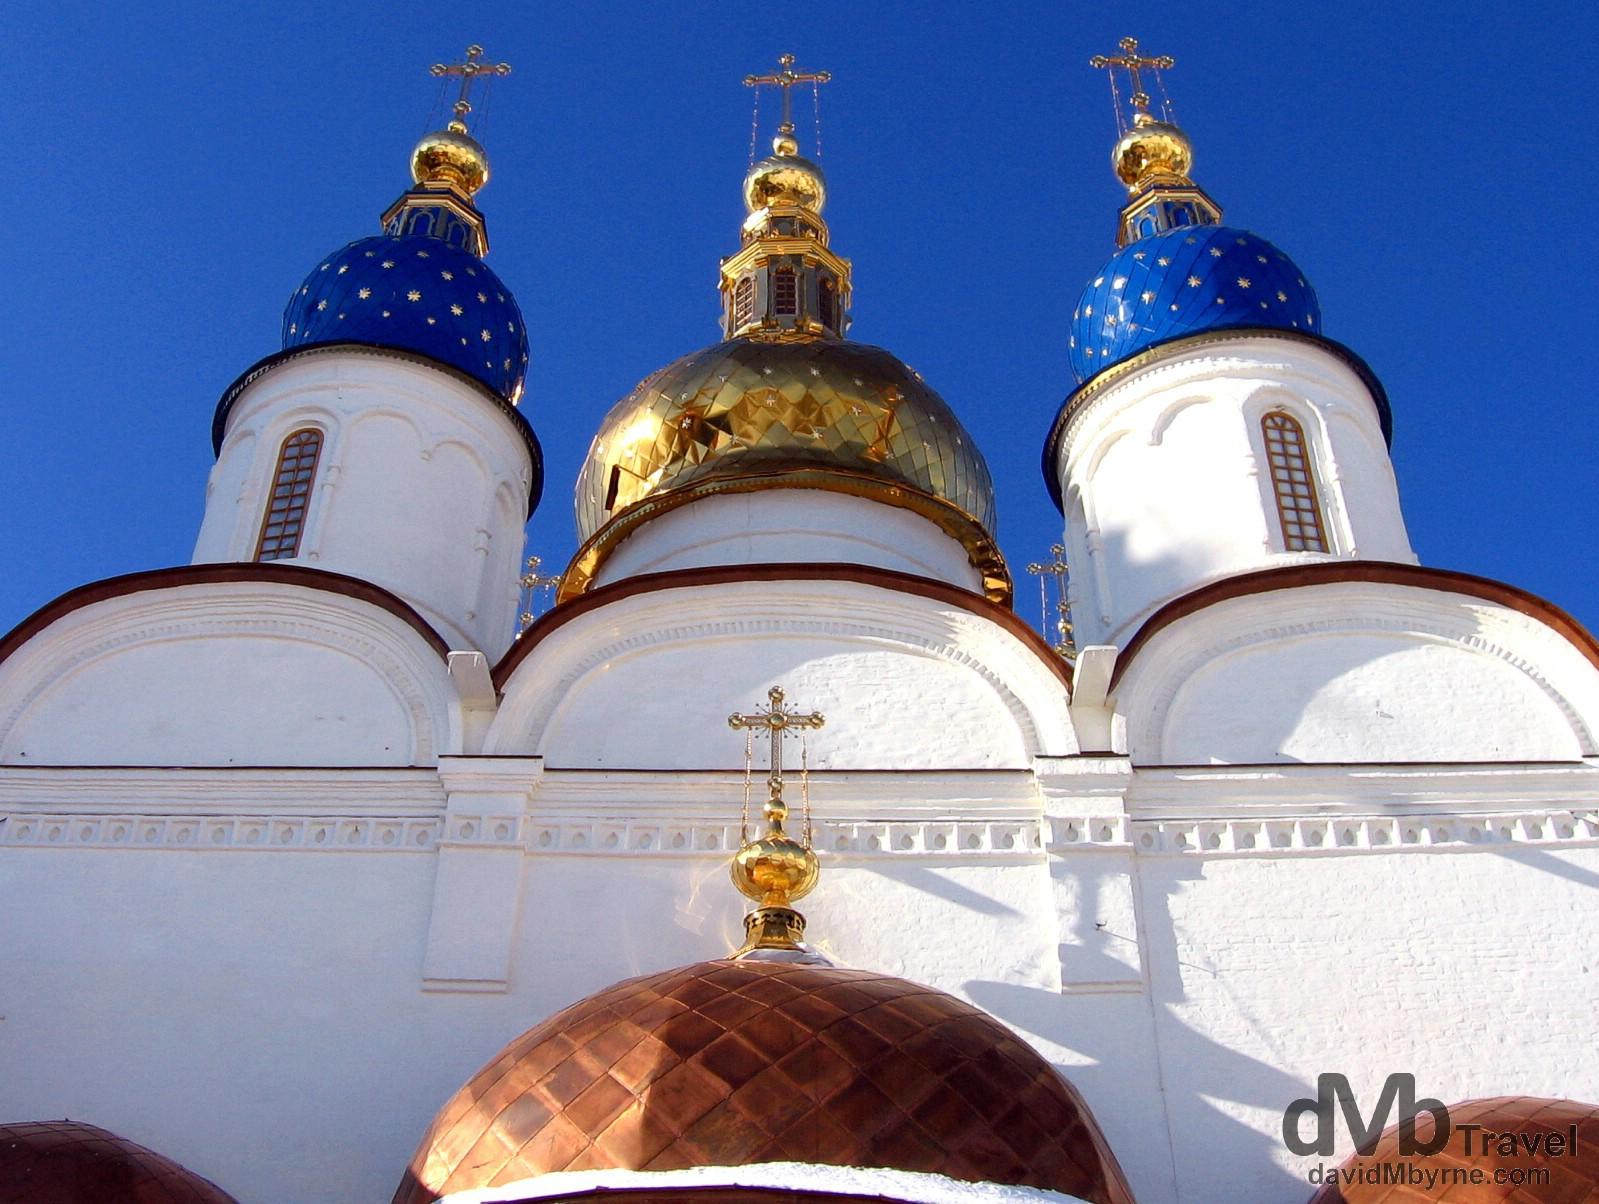 Tobolsk, Siberian Russia